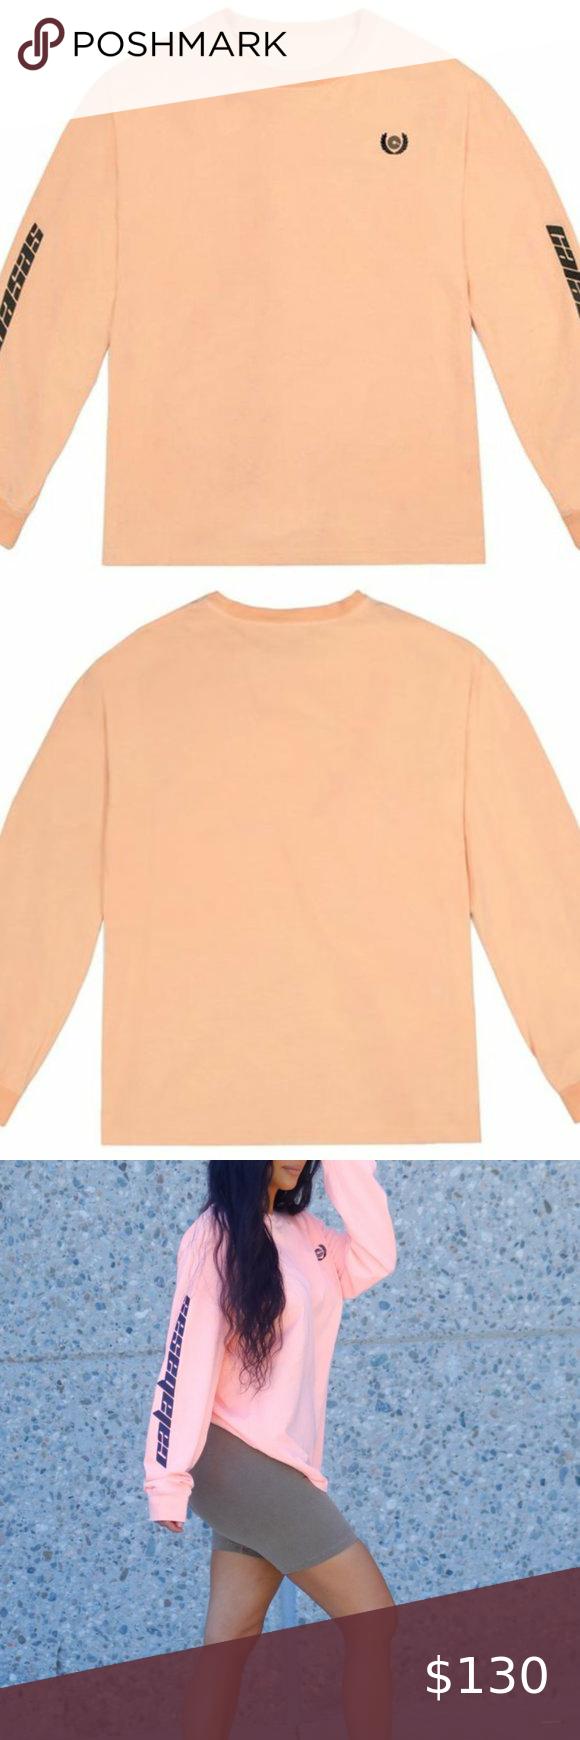 Yeezy Calabasas Neon Orange Long Sleeve